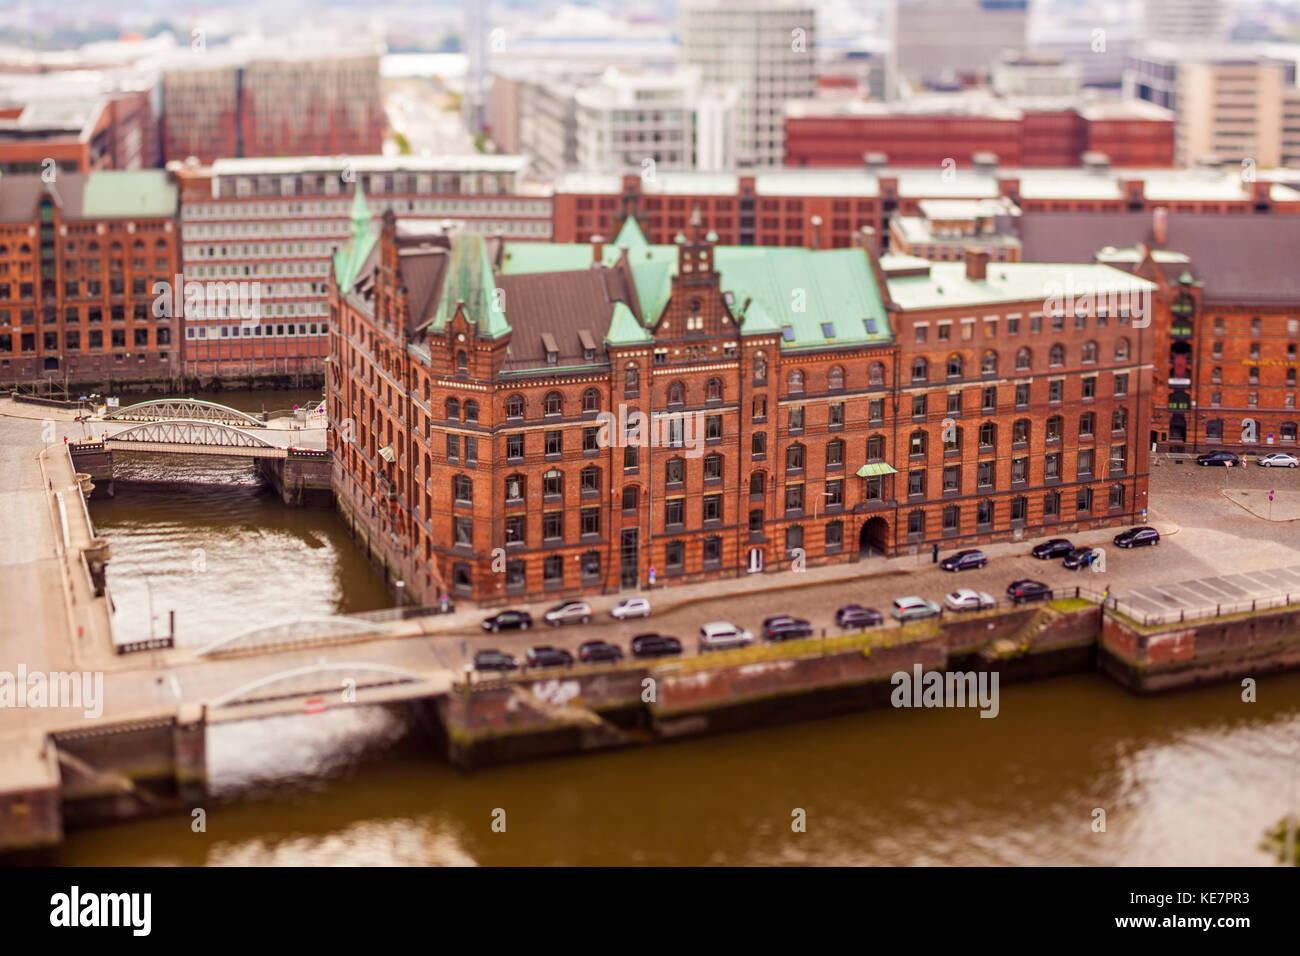 Magazzino storico a Speicherstadt di Amburgo, tilt-shift photography Immagini Stock